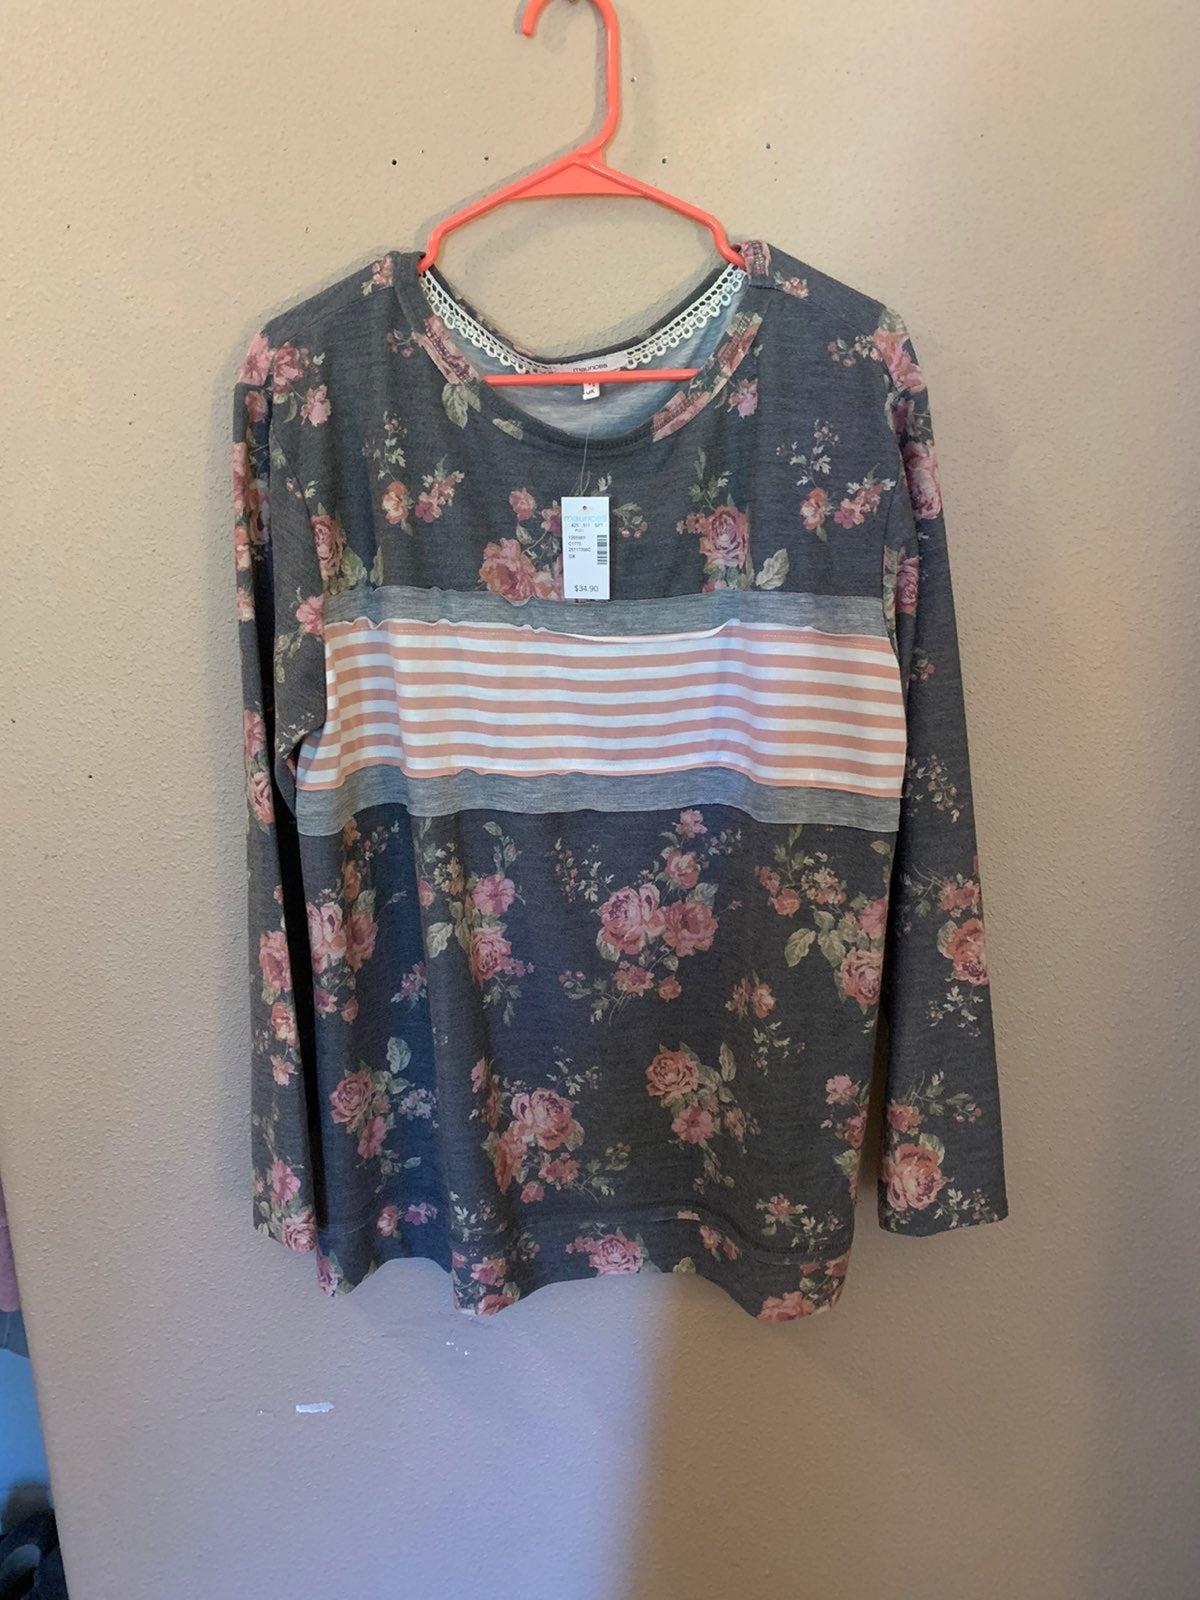 Maurices Crewneck Sweatshirt